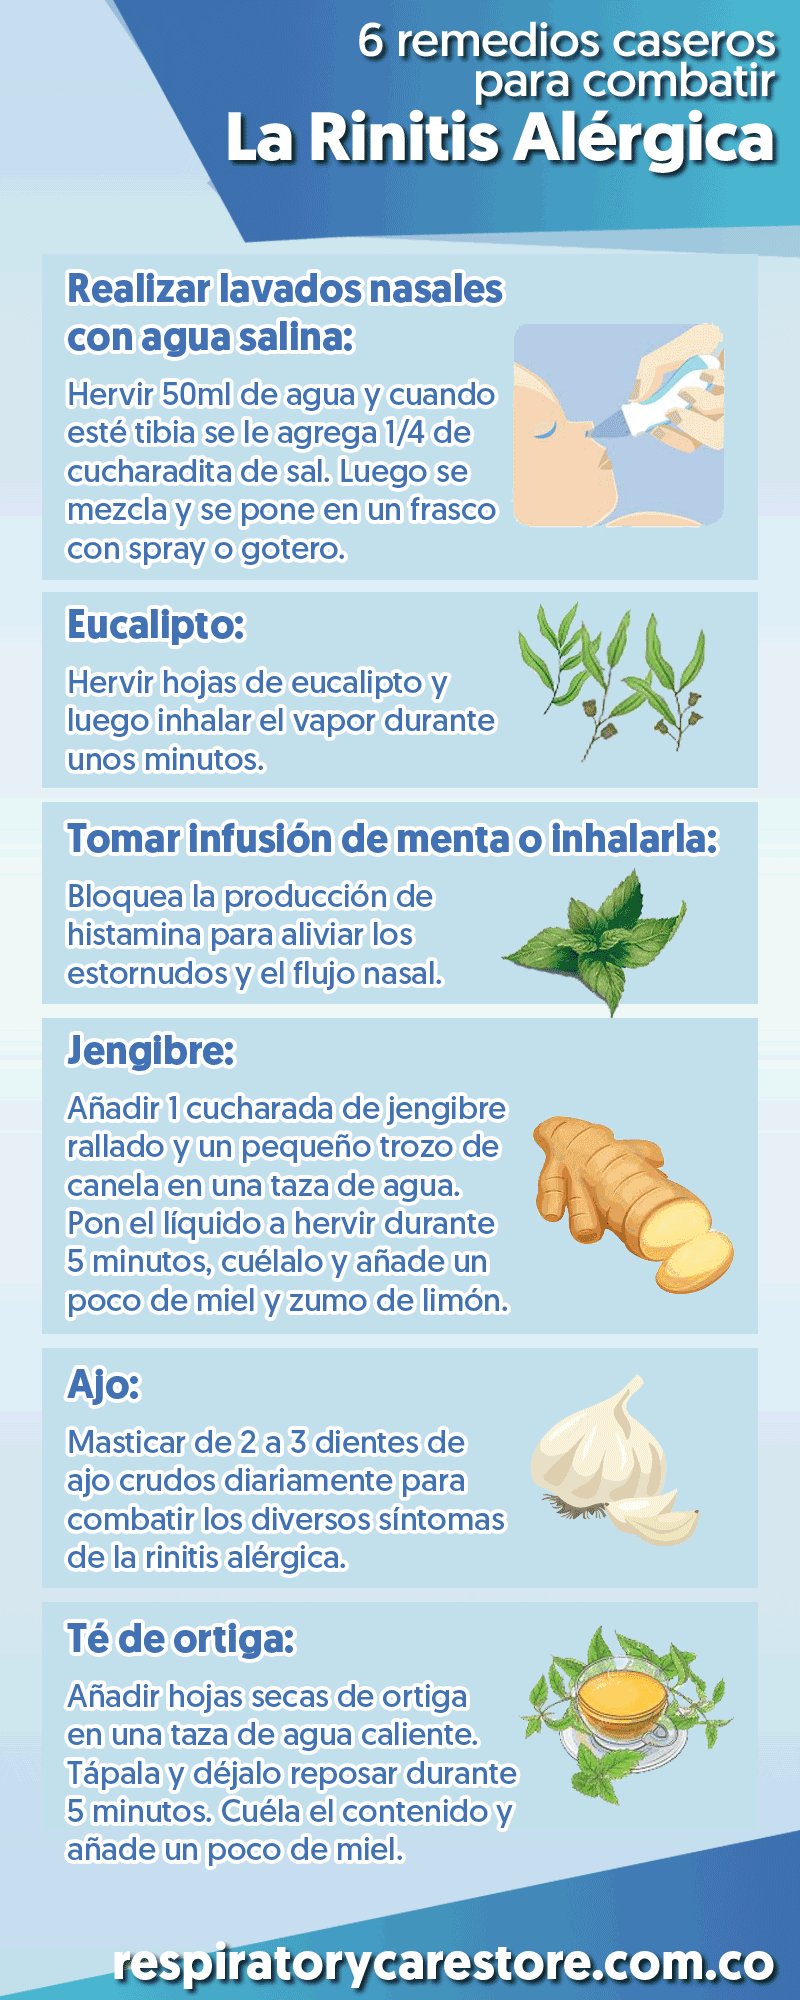 Rinitis Alérgica Rinitis Alérgica Remedios Caseros Remedios